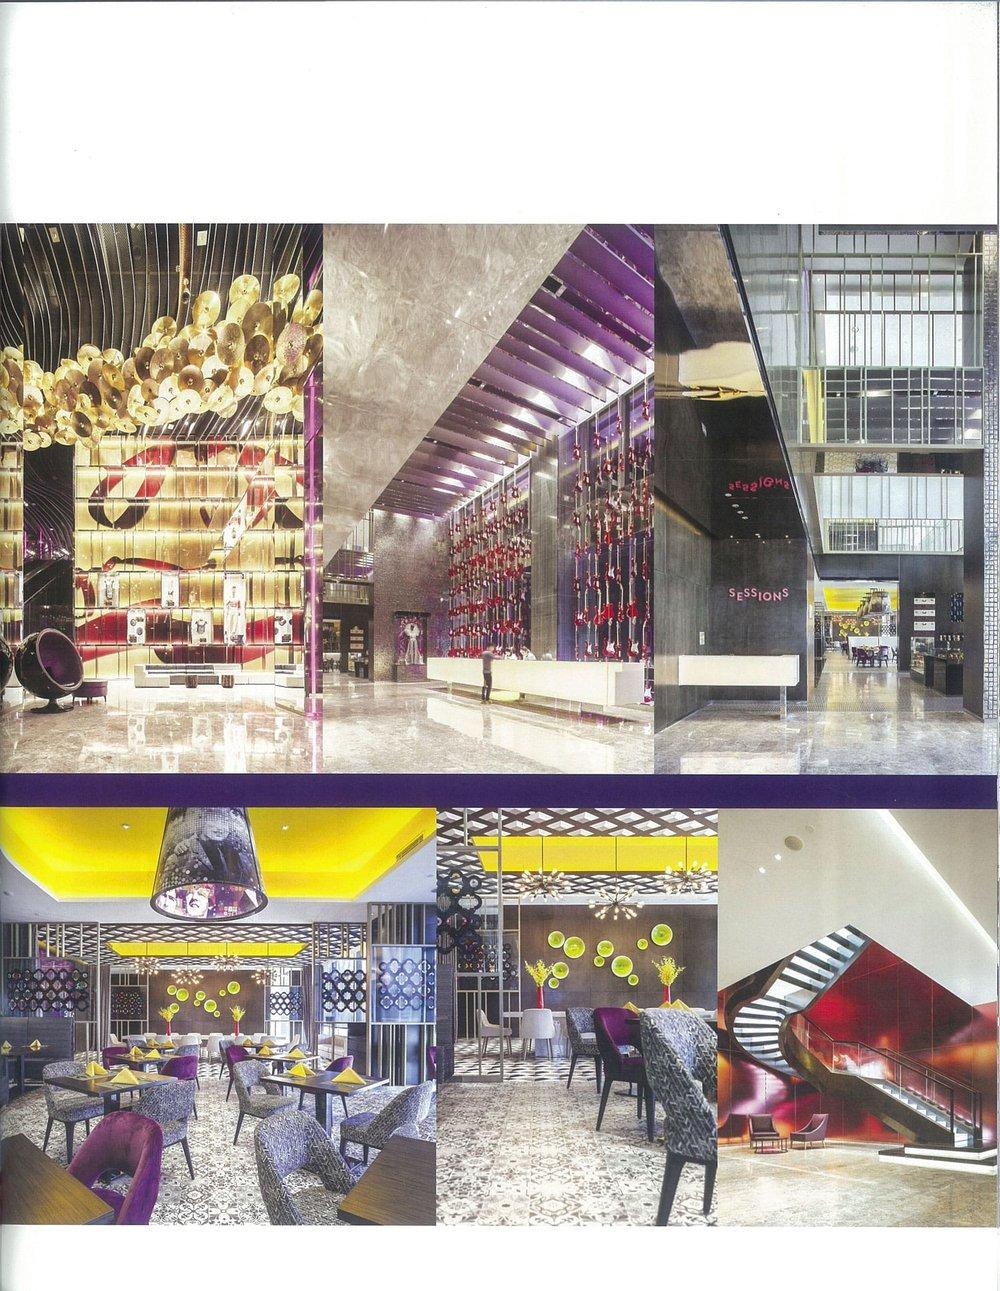 hinge_Vol-267_Aug-Sep-2018-Hardrock-Hotel-Shenzhen-3.jpg